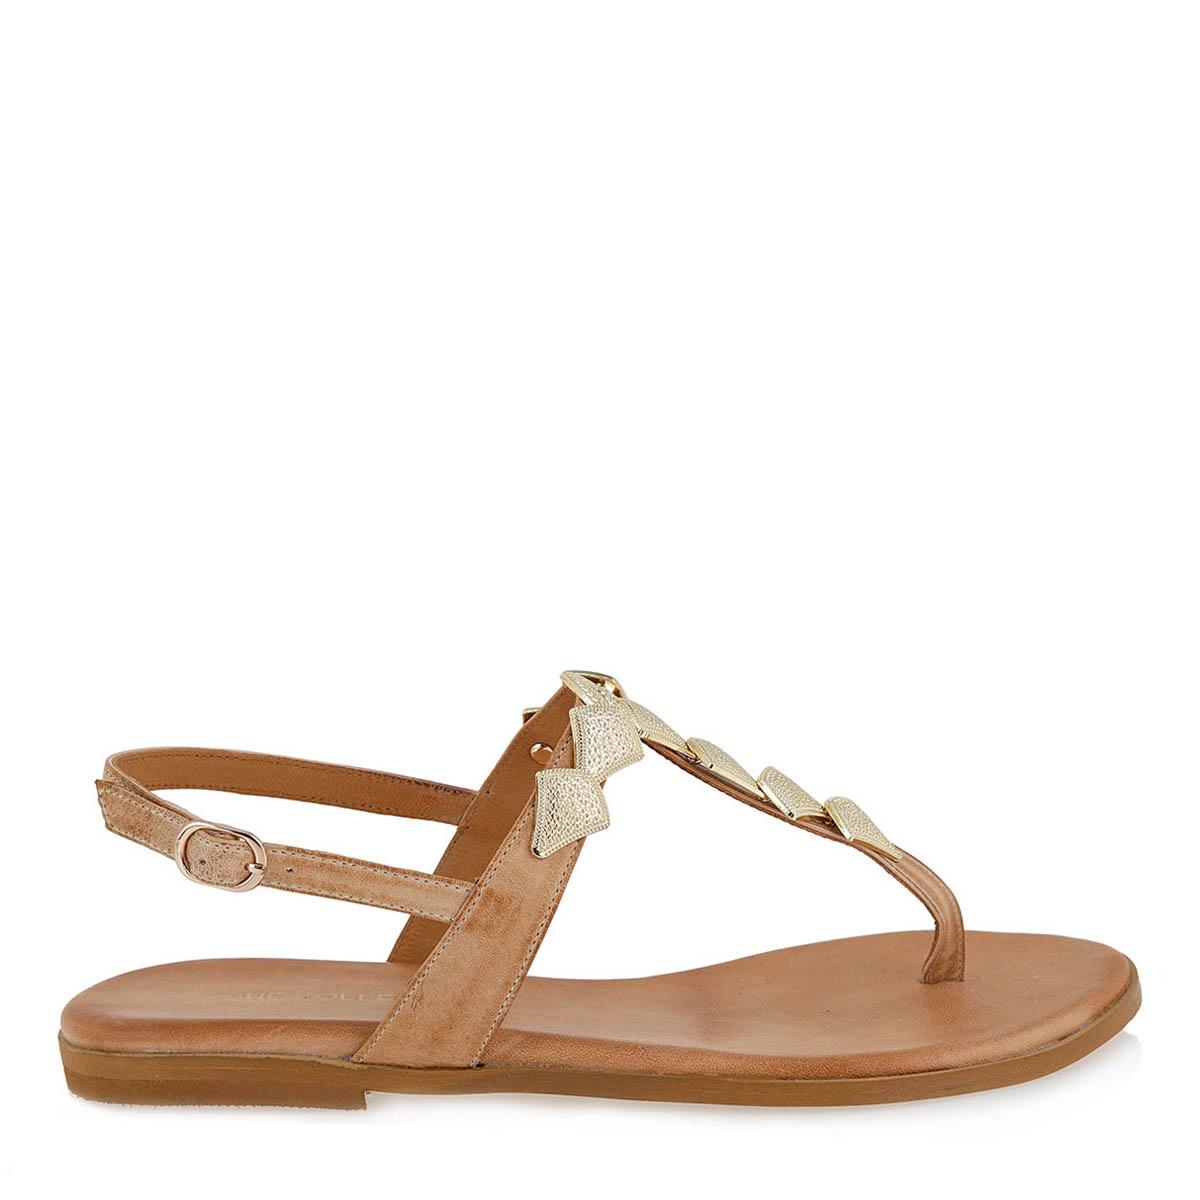 bda1f286ef2 FLATS σχέδιο: I409X1261 - Roe Shoes Collection